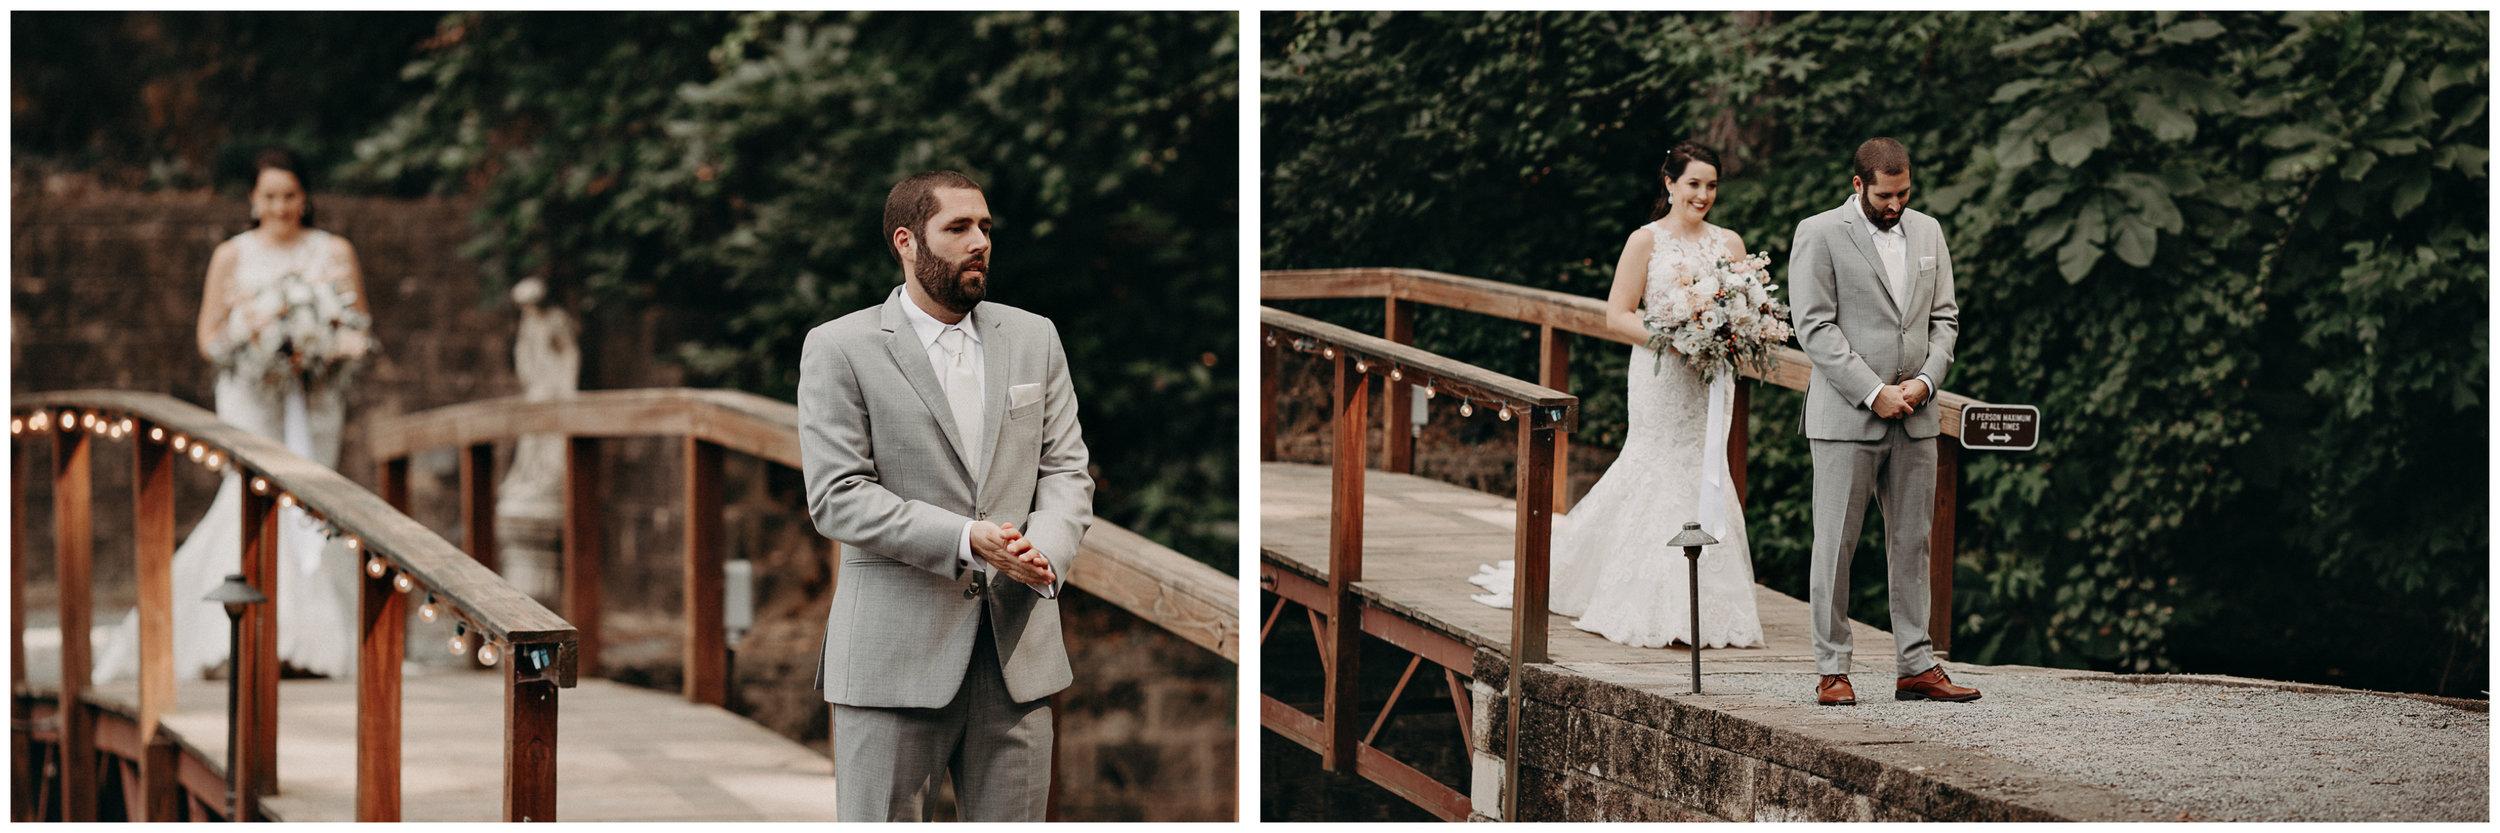 22  first look wedding day atlanta-ga .jpg